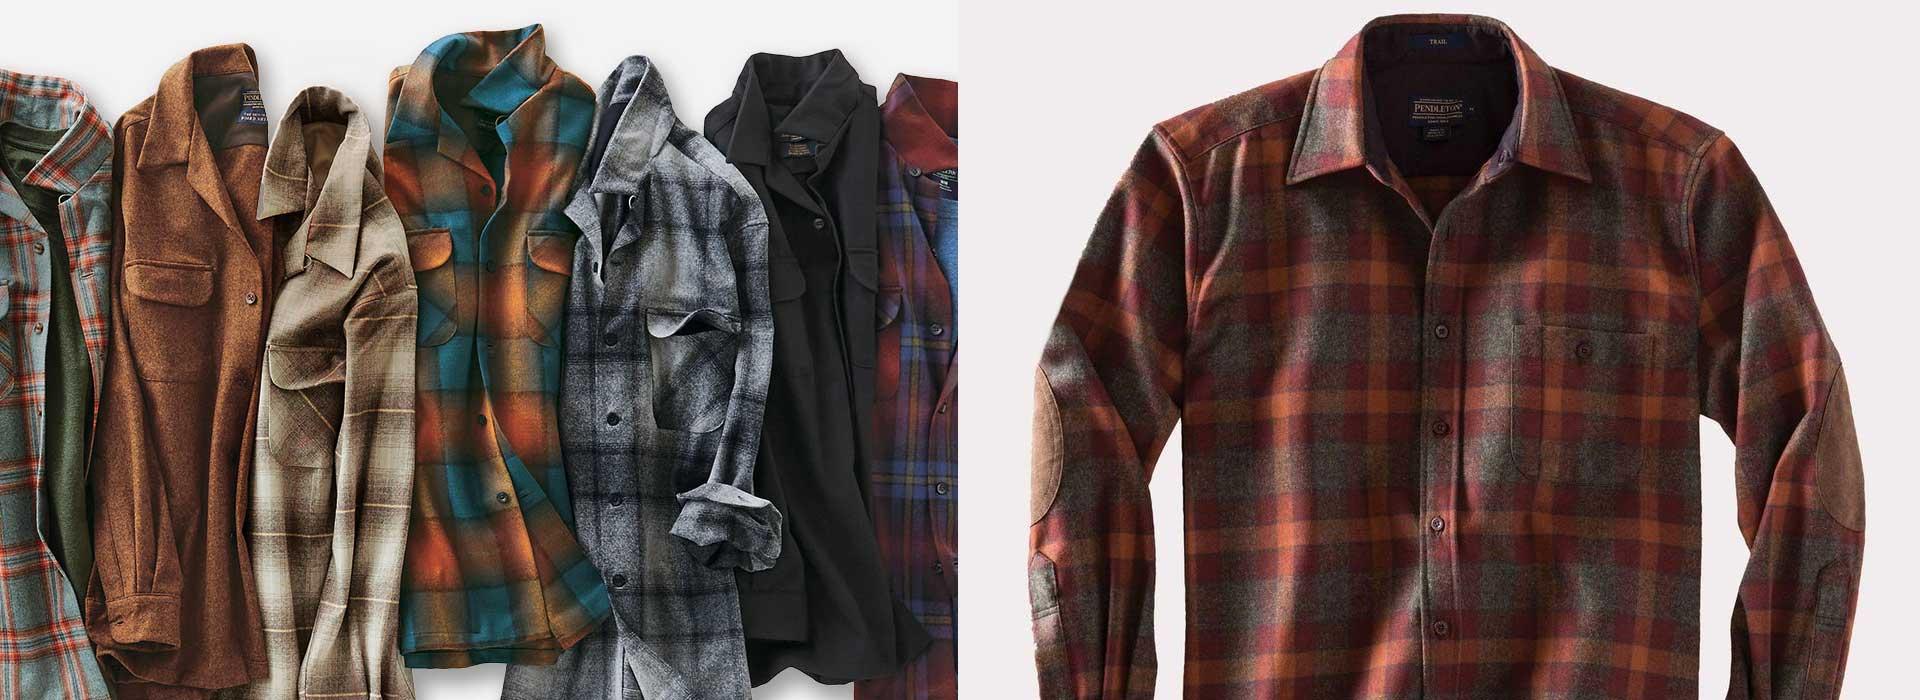 Up to 50% off Pendleton shirts